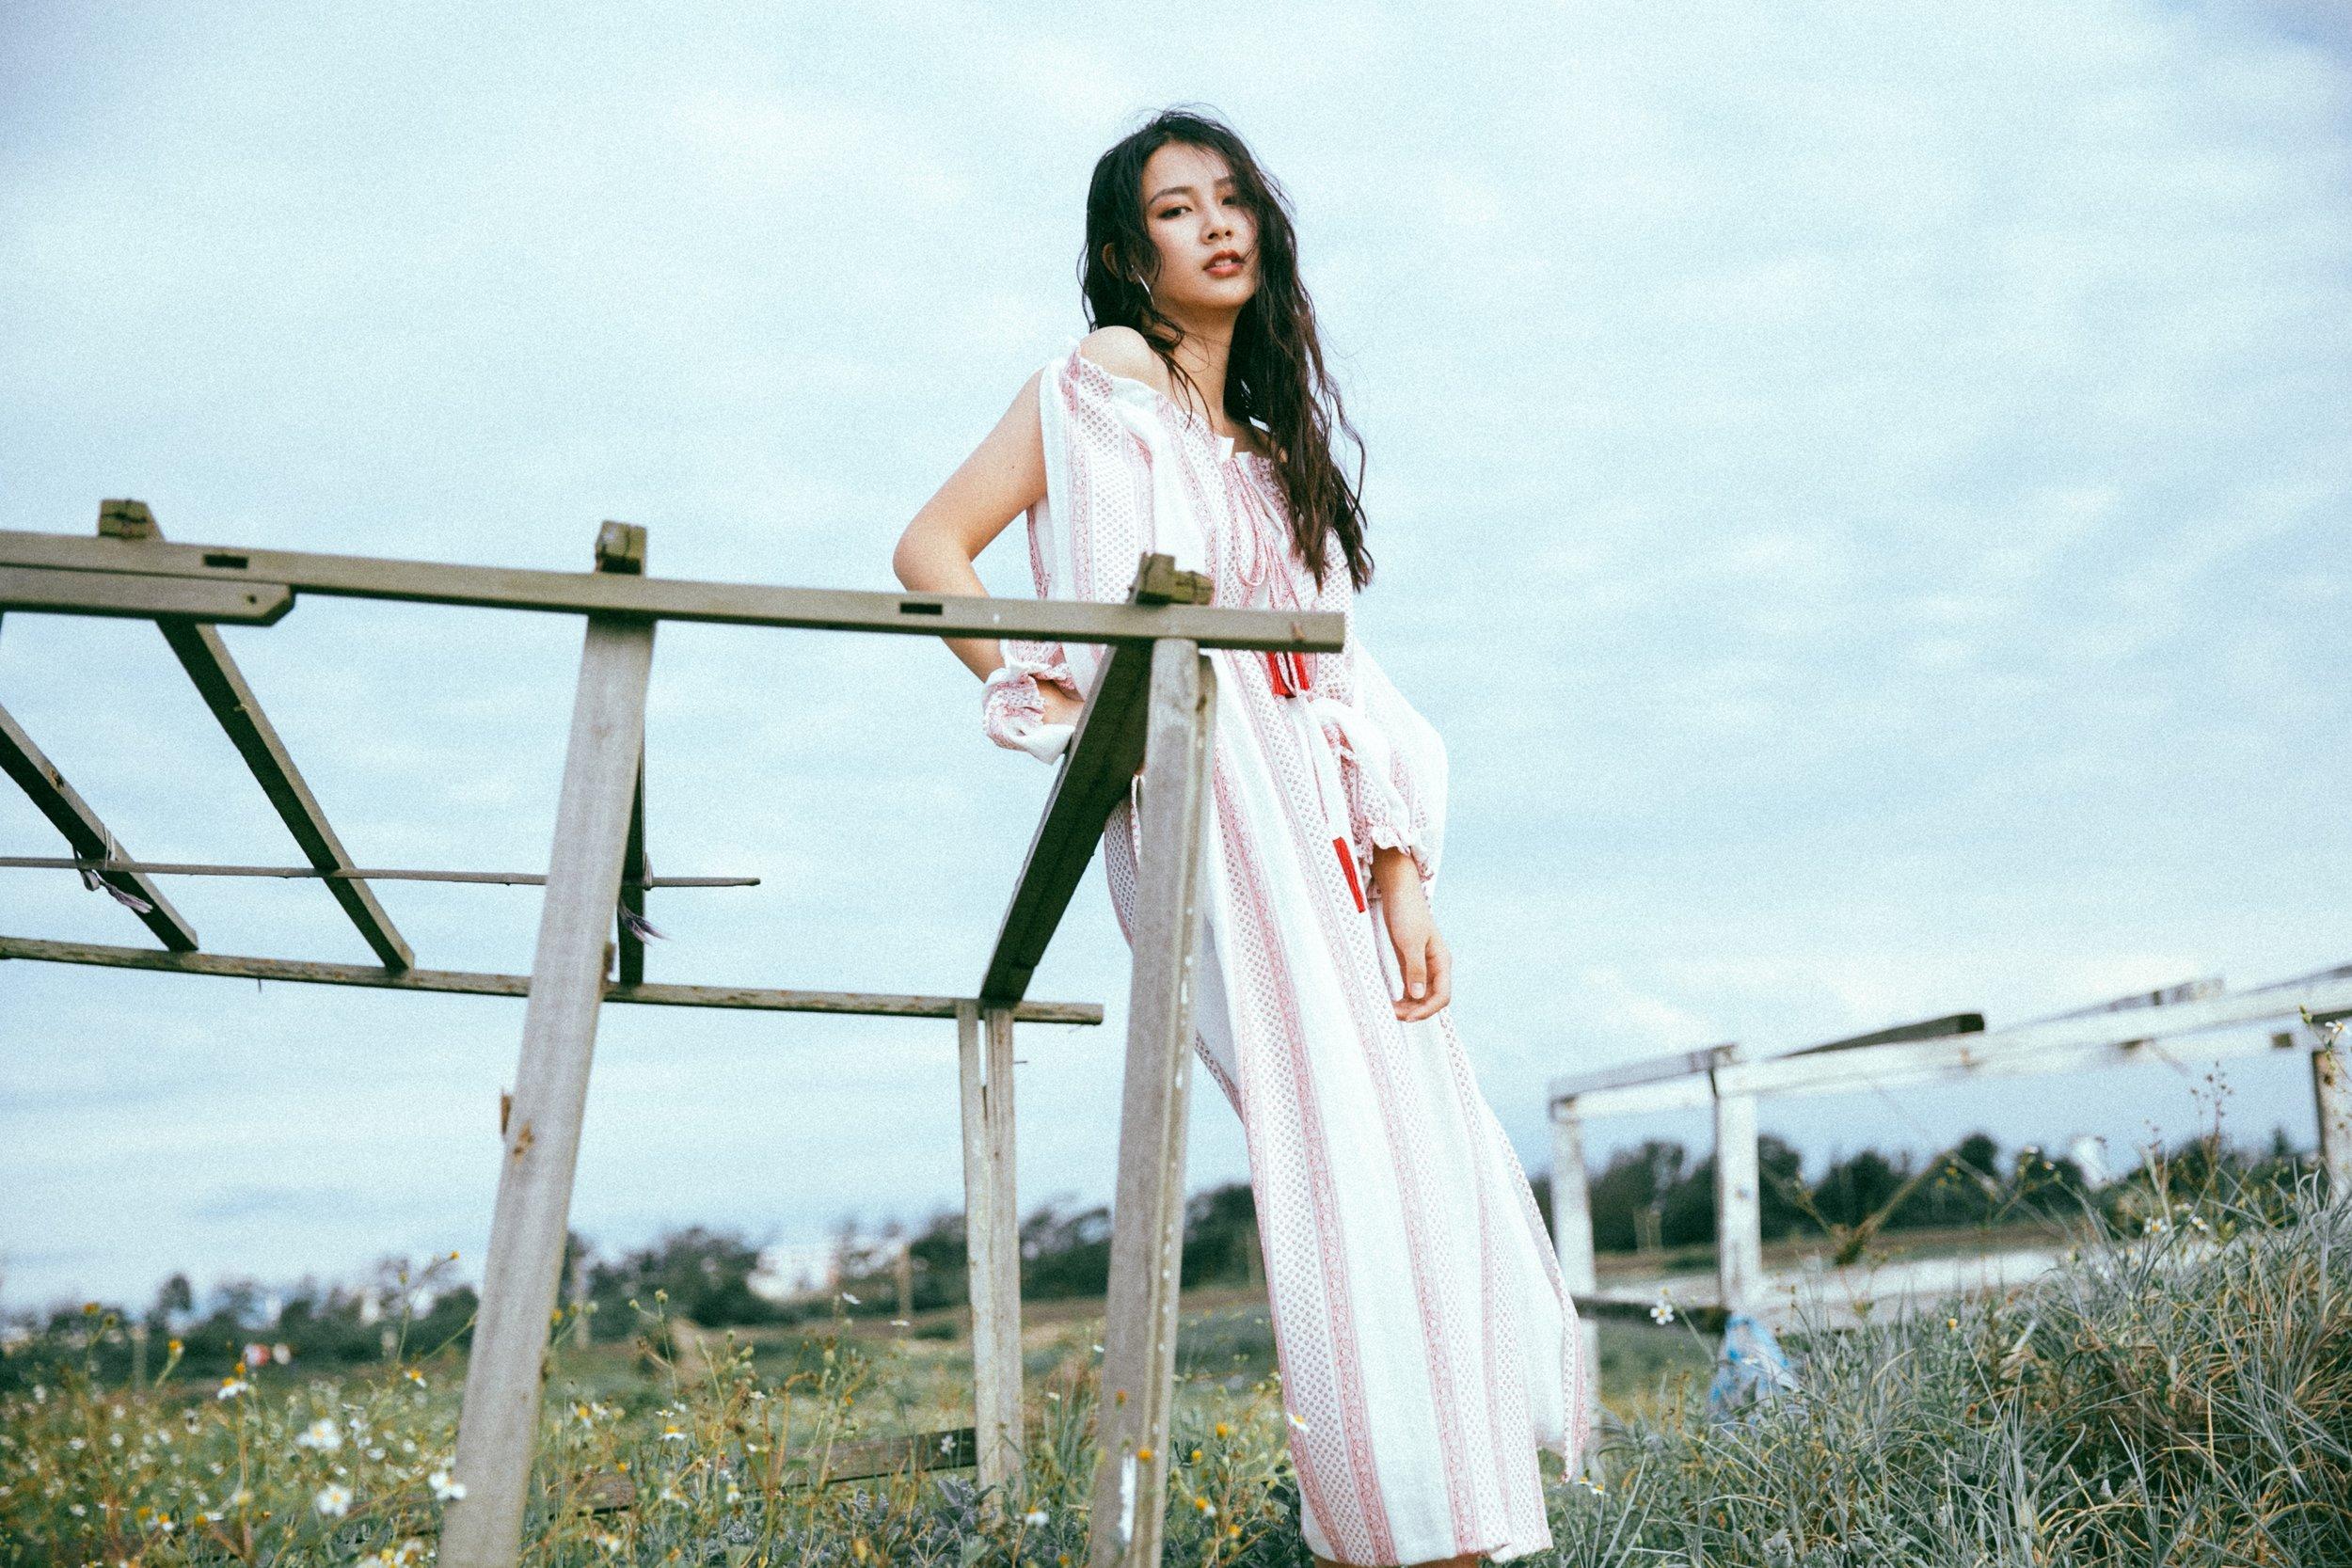 portrait-jane-girl-寫真-許厝港-桃園-17.jpg